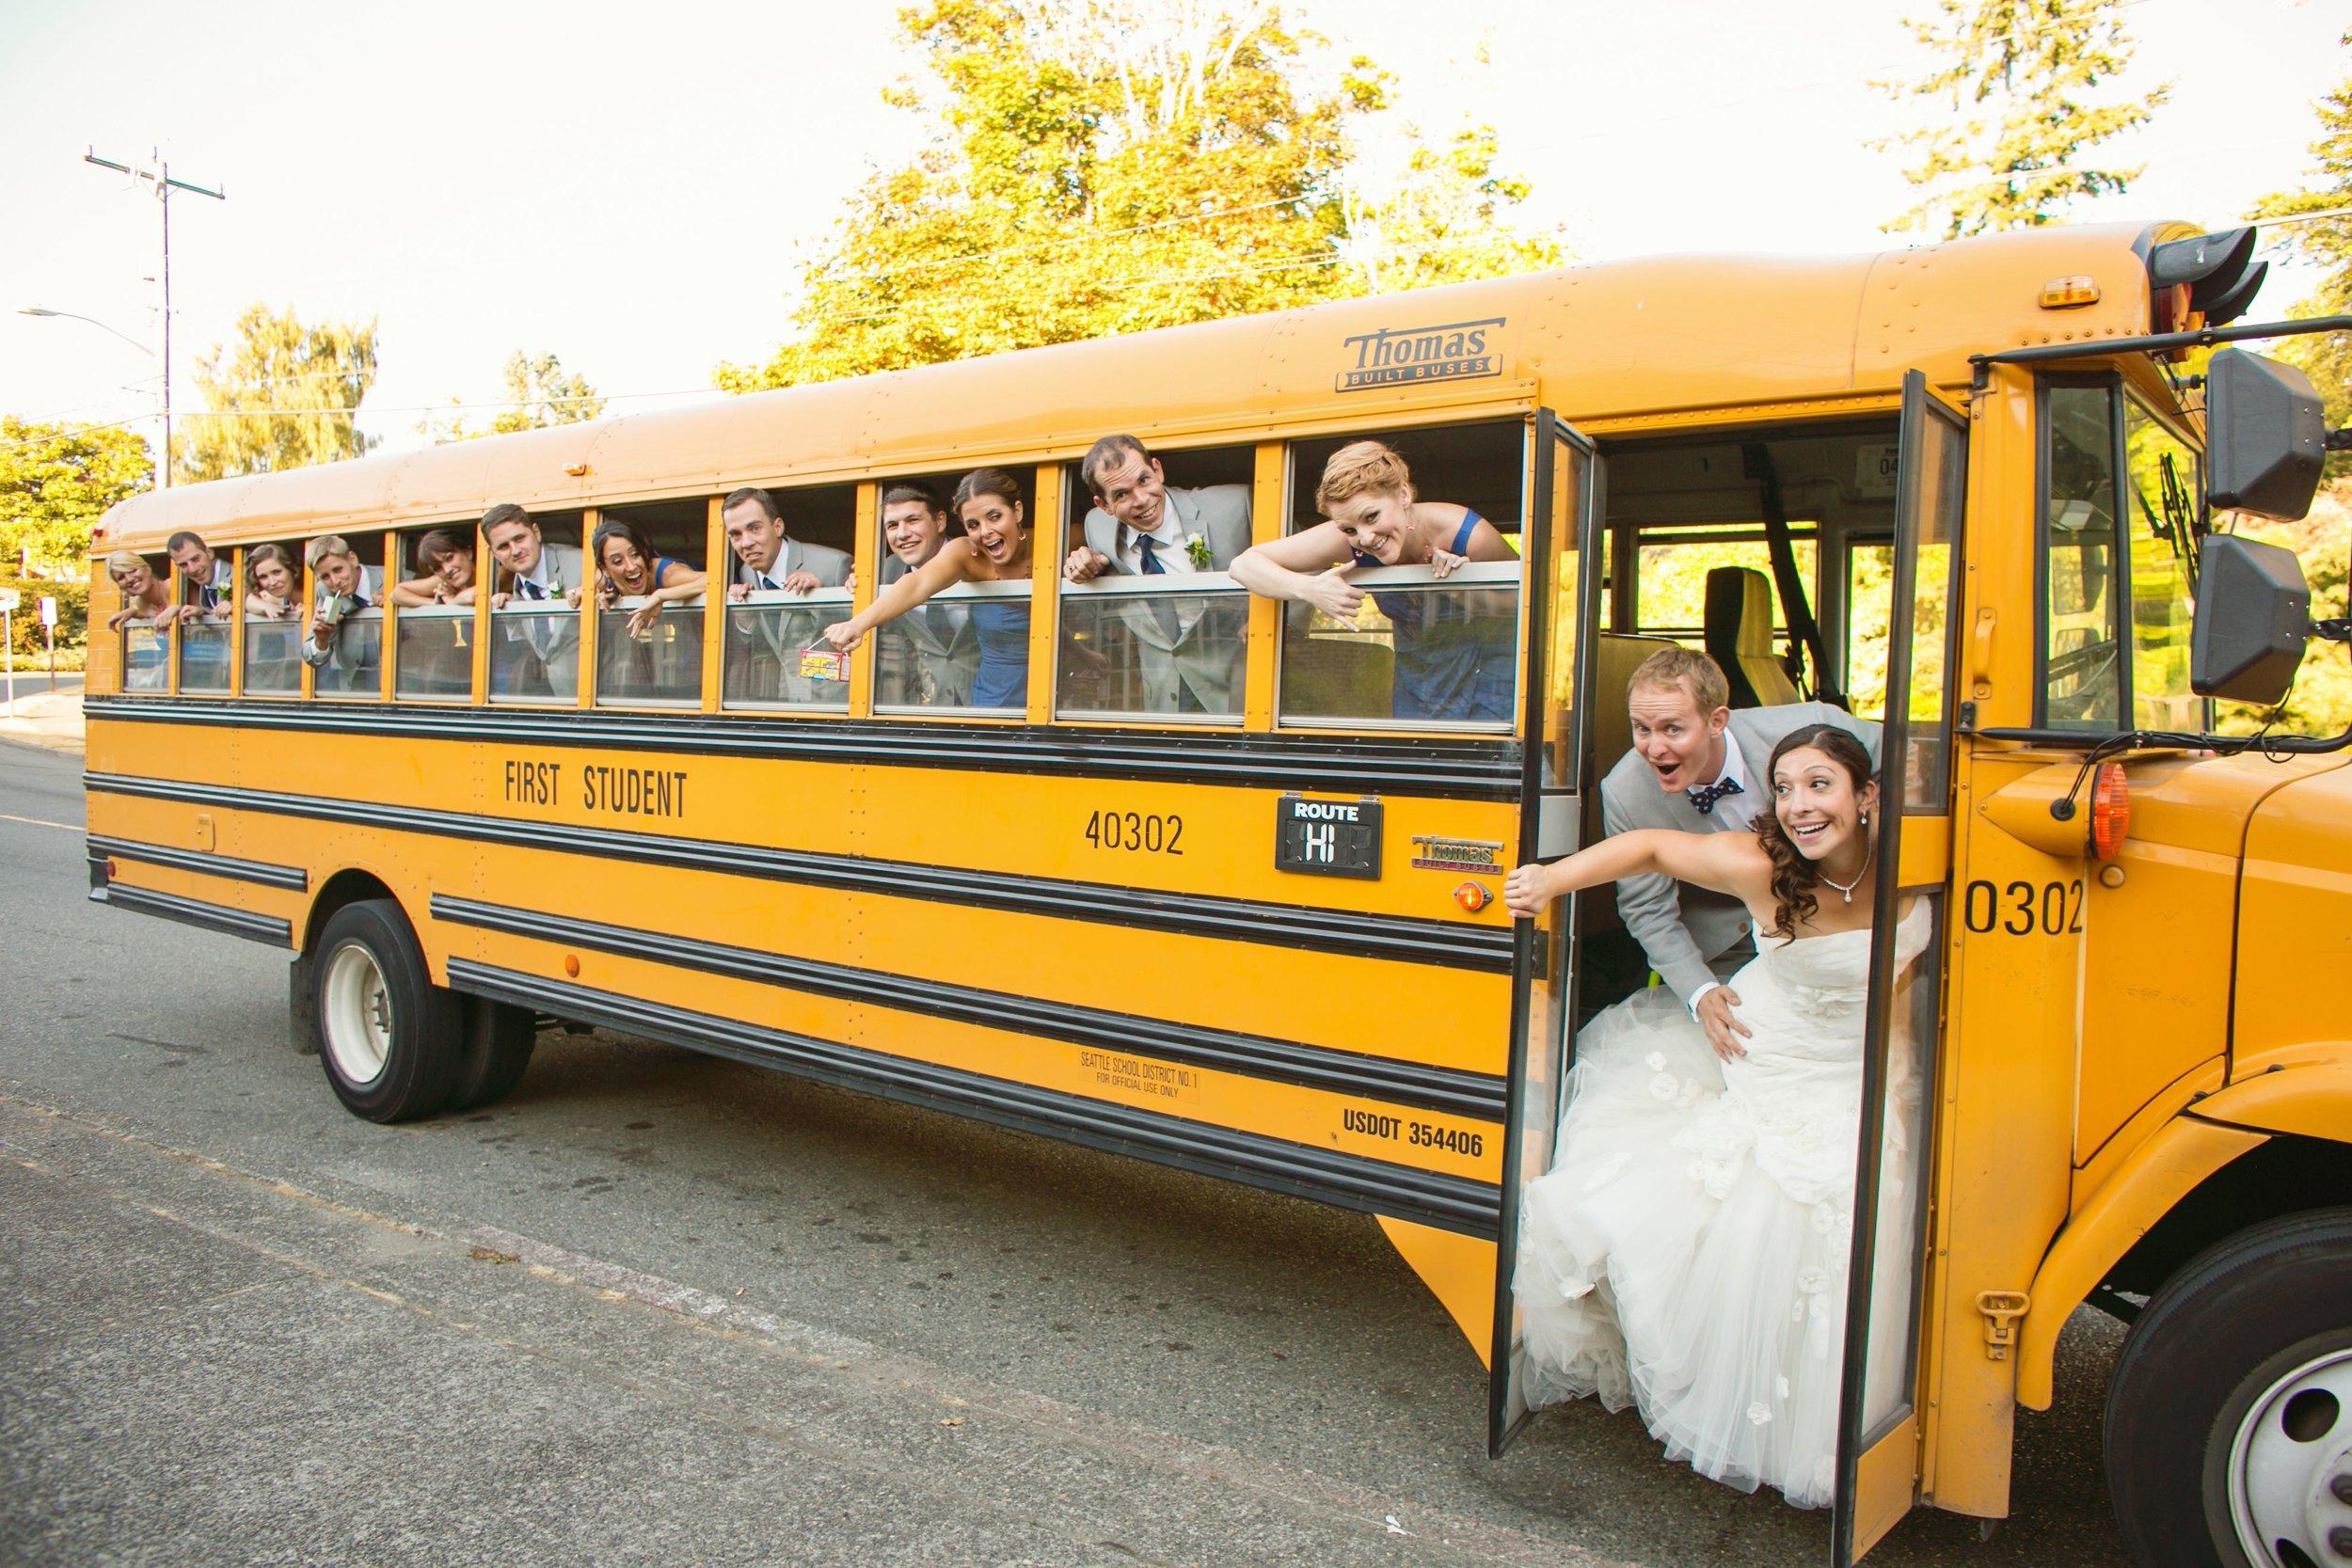 school-bus-rental-for-wedding.jpg